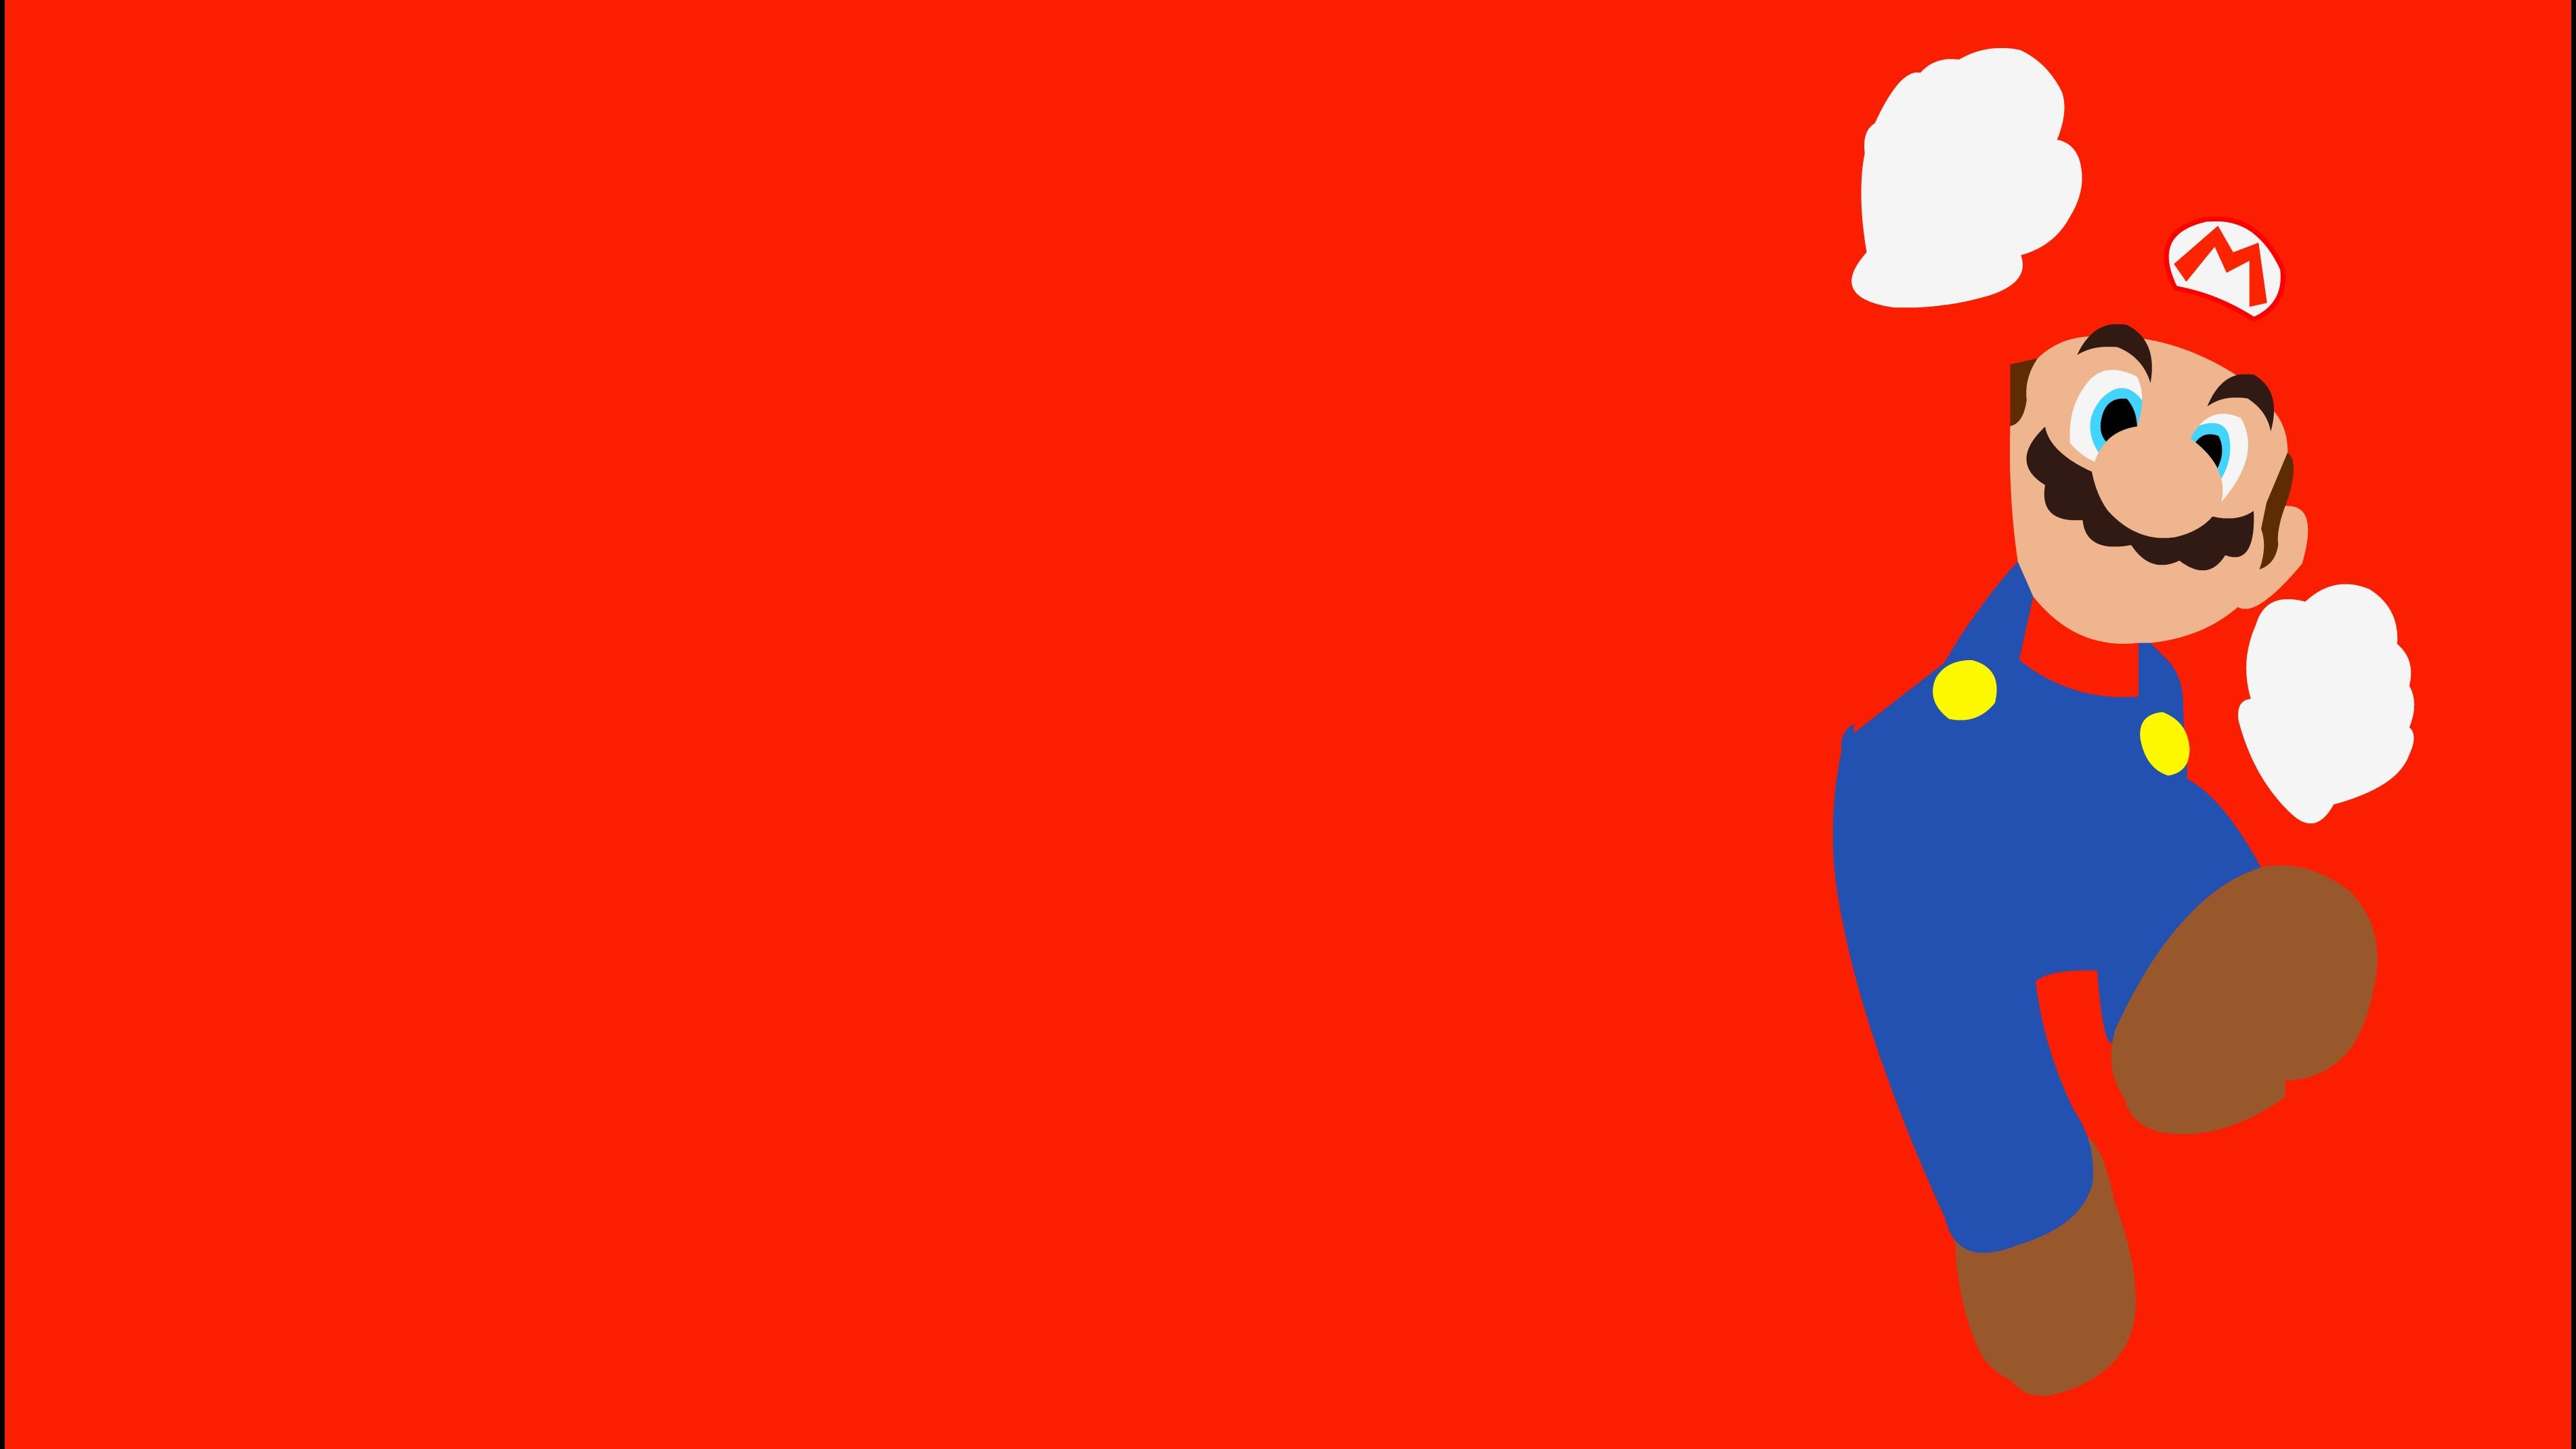 Mario Desktop Backgrounds: Mario HD Wallpaper